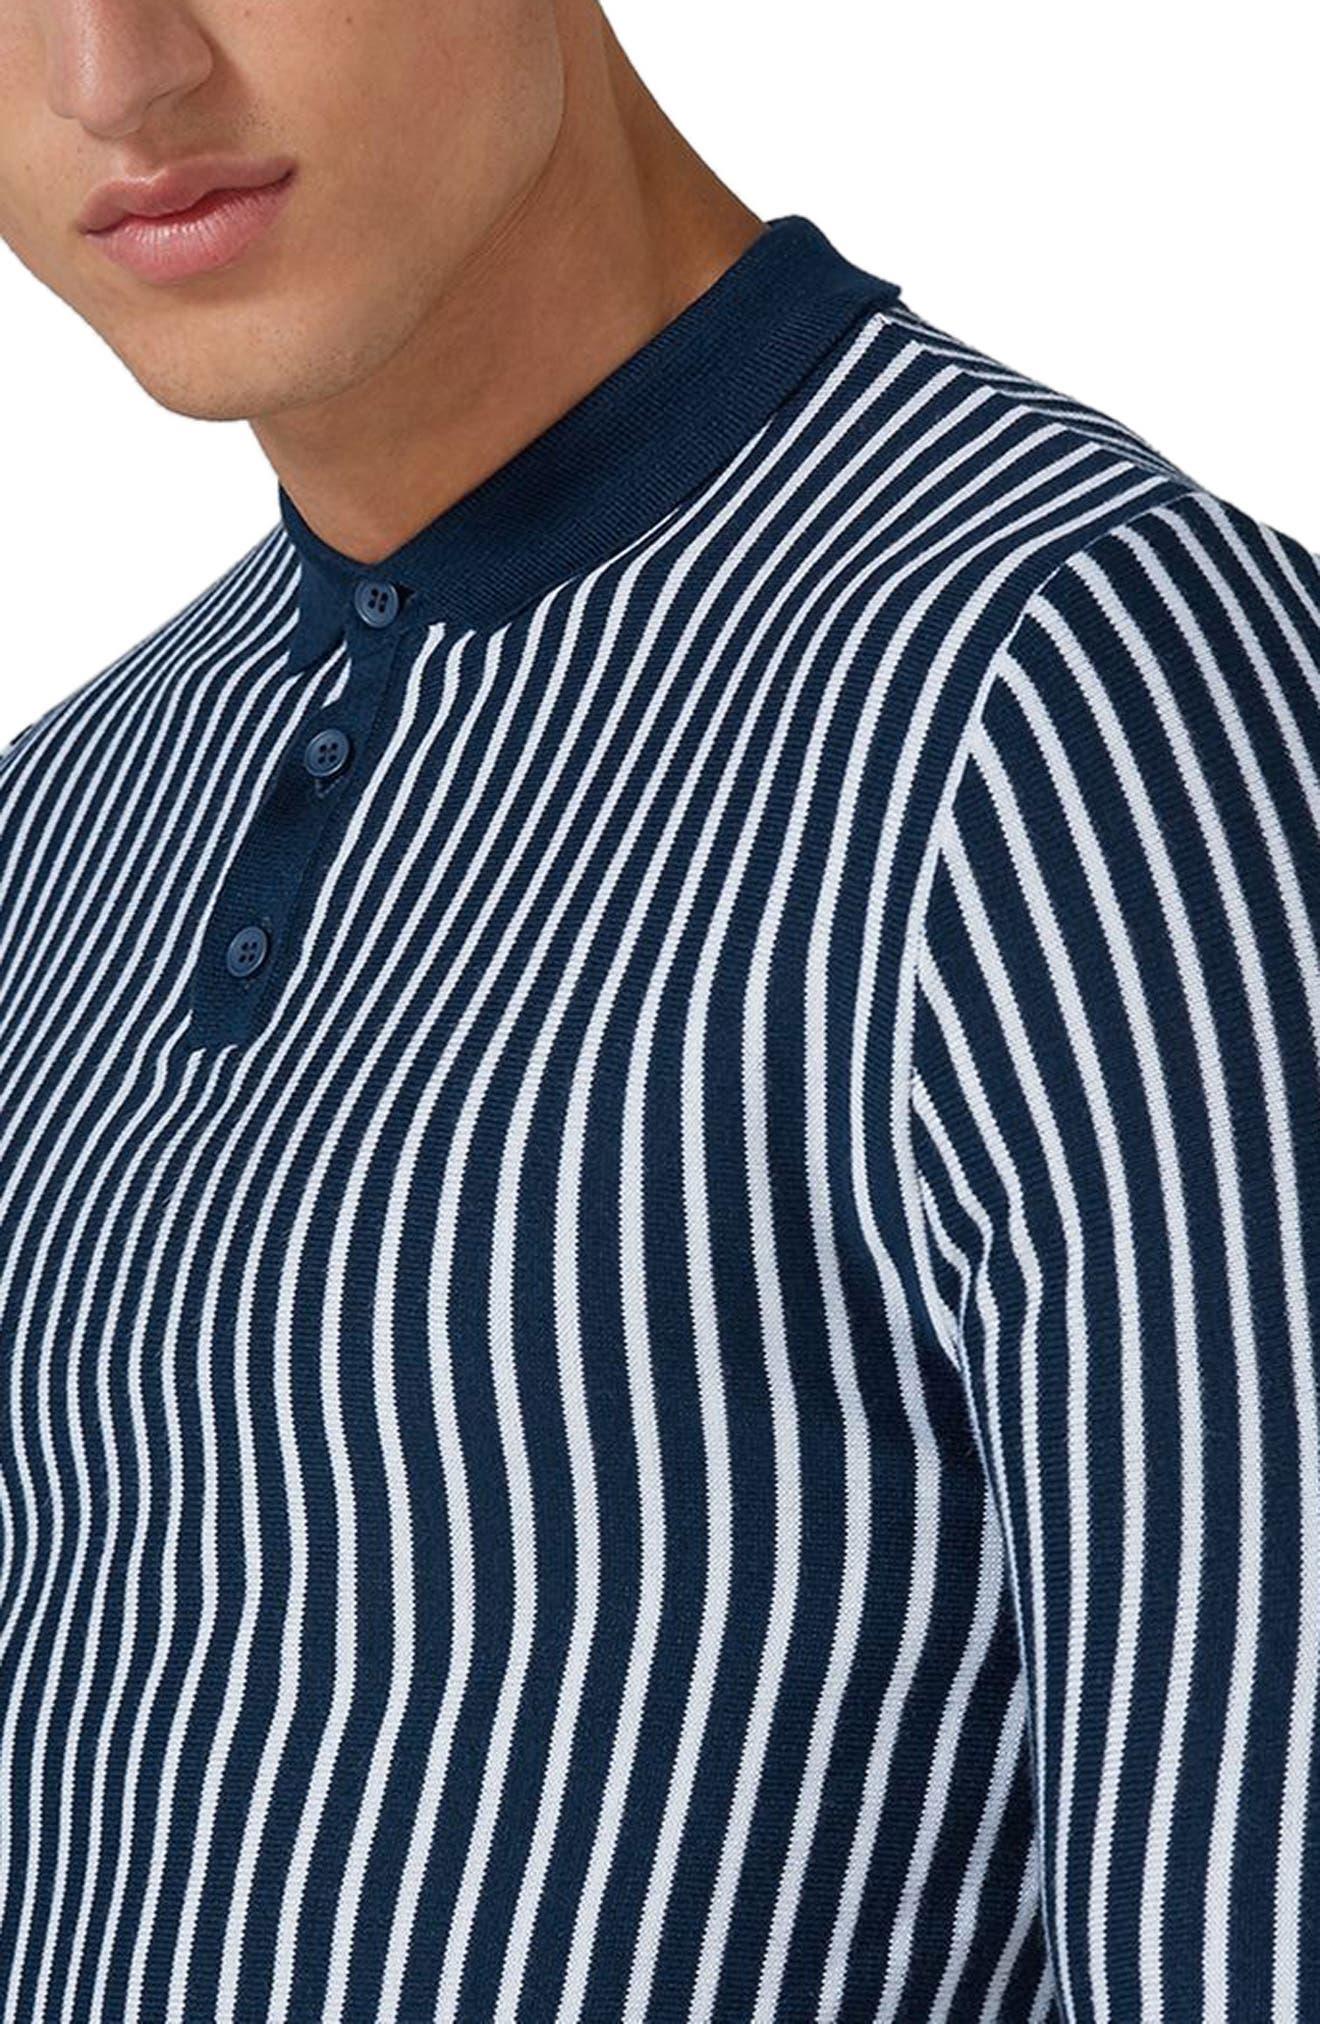 Stripe Knit Polo Sweater,                             Alternate thumbnail 3, color,                             410